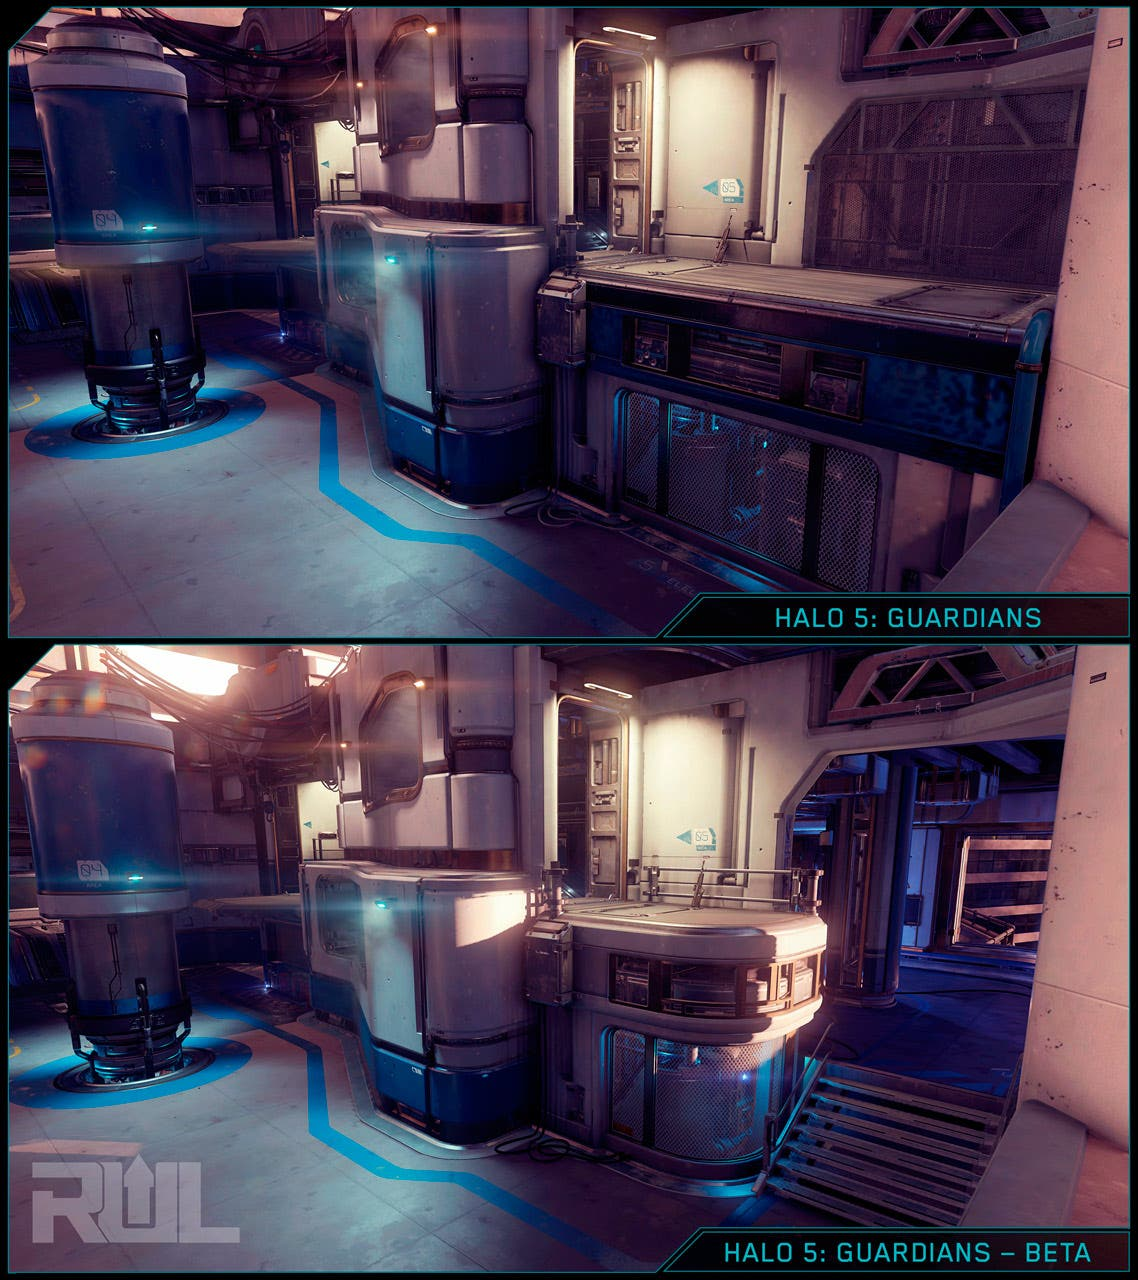 H5-Guardians-Empire-Establishing-Electrical-Comparison-Stack